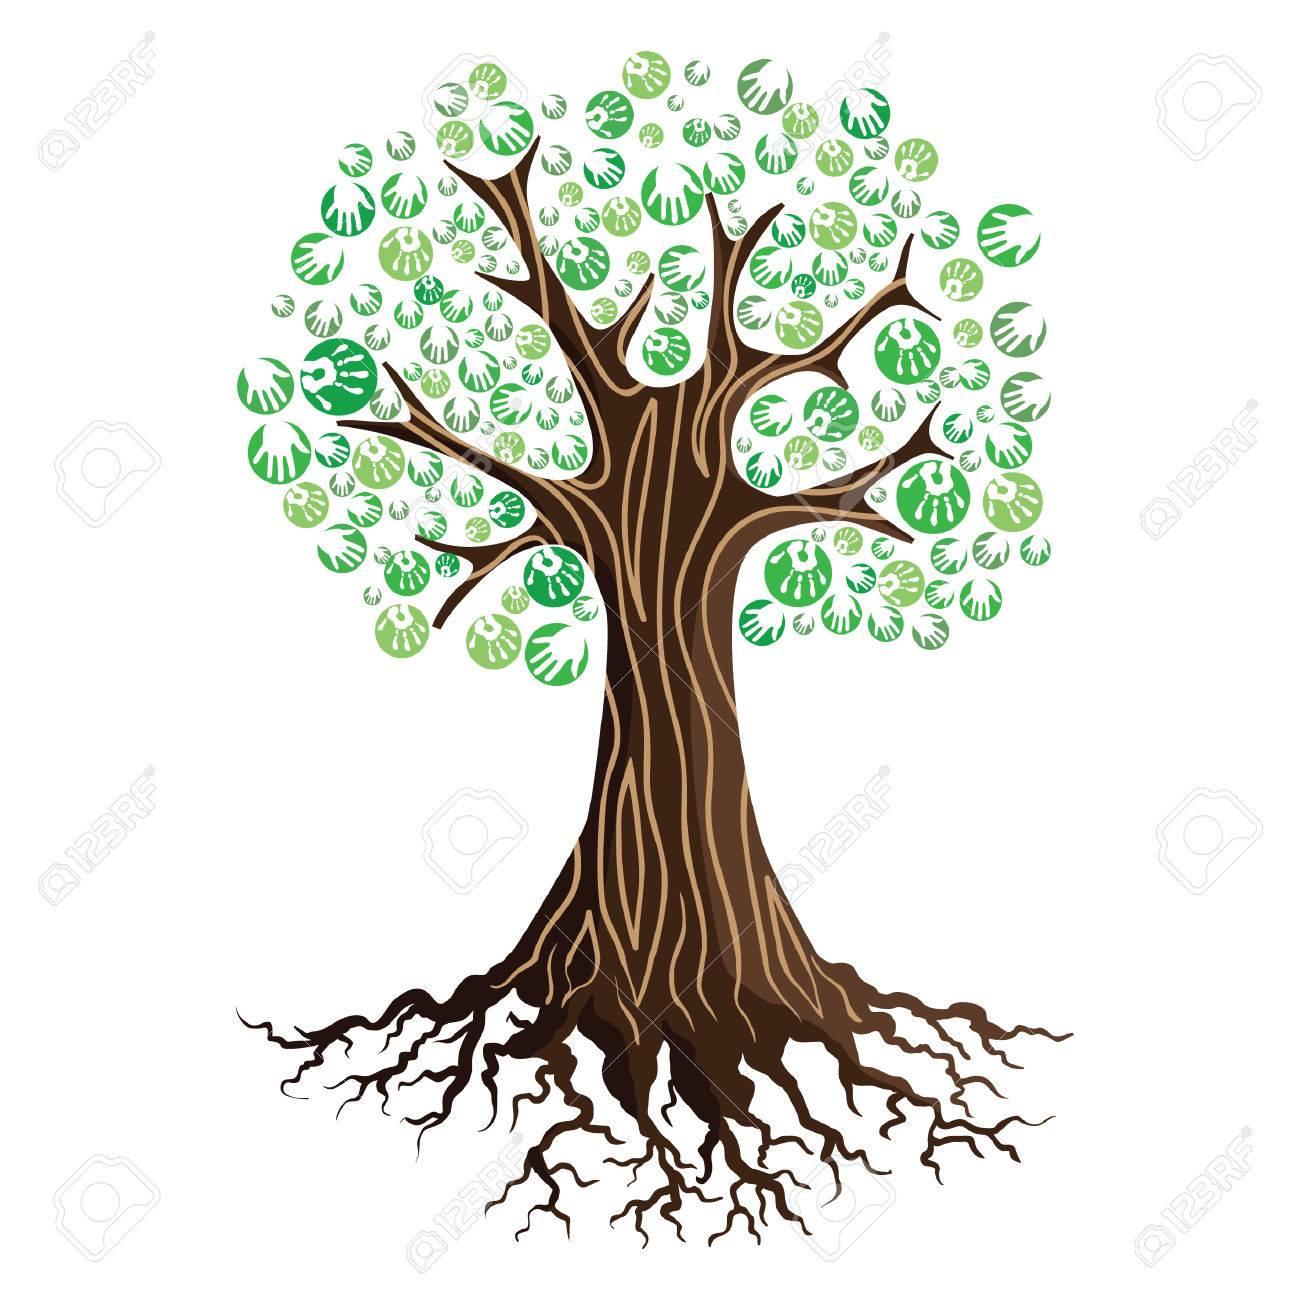 tree with hand prints - 53842208